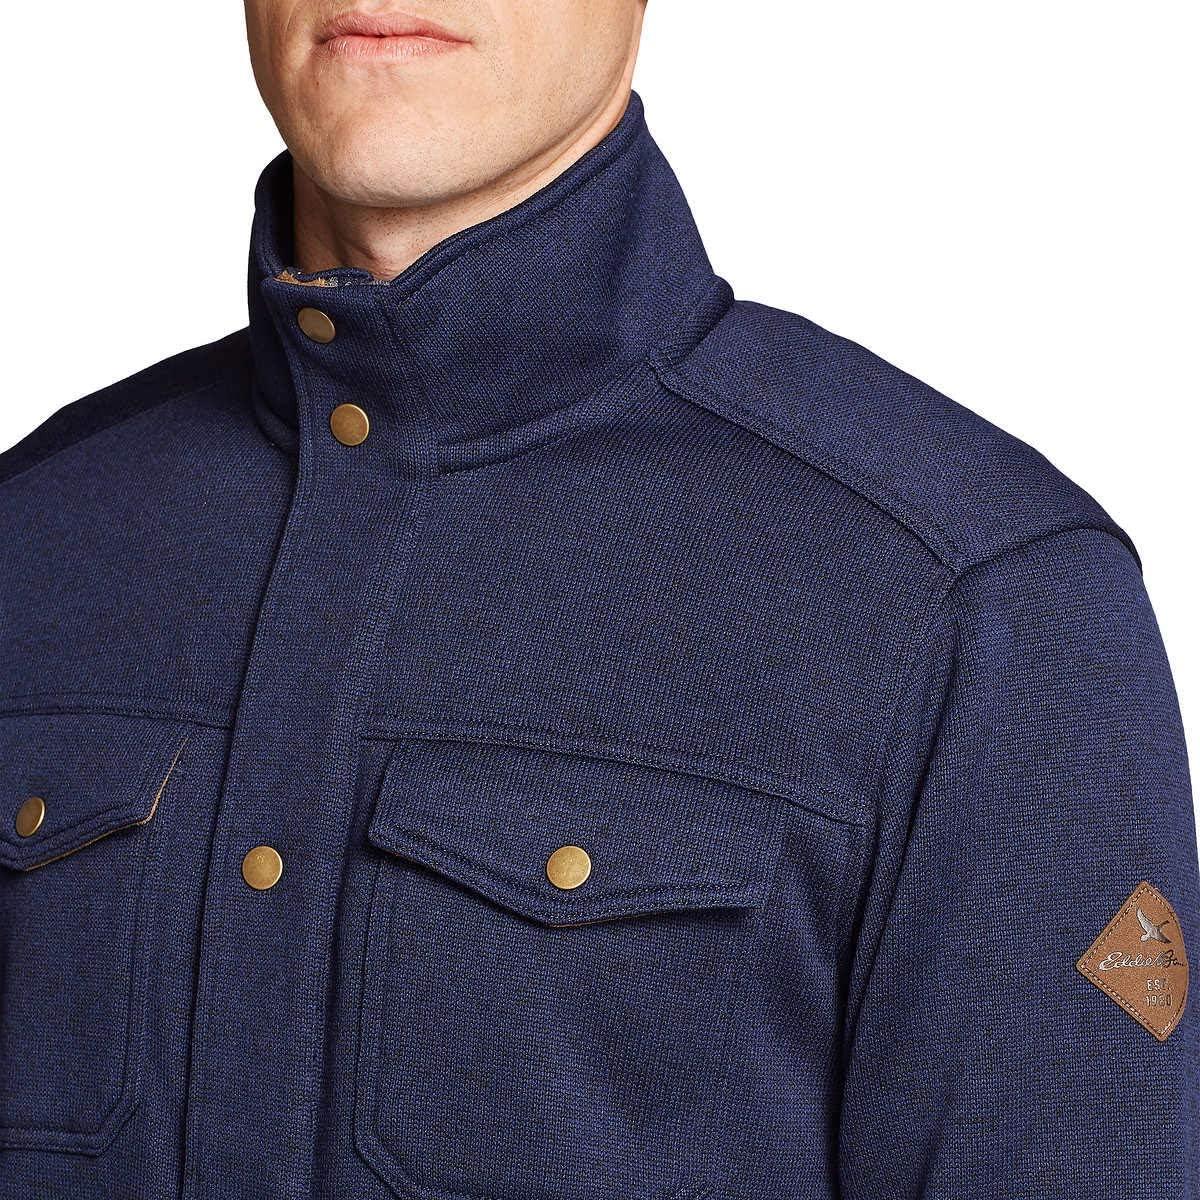 Eddie Bauer Mens Radiator 4-Pocket Jacket